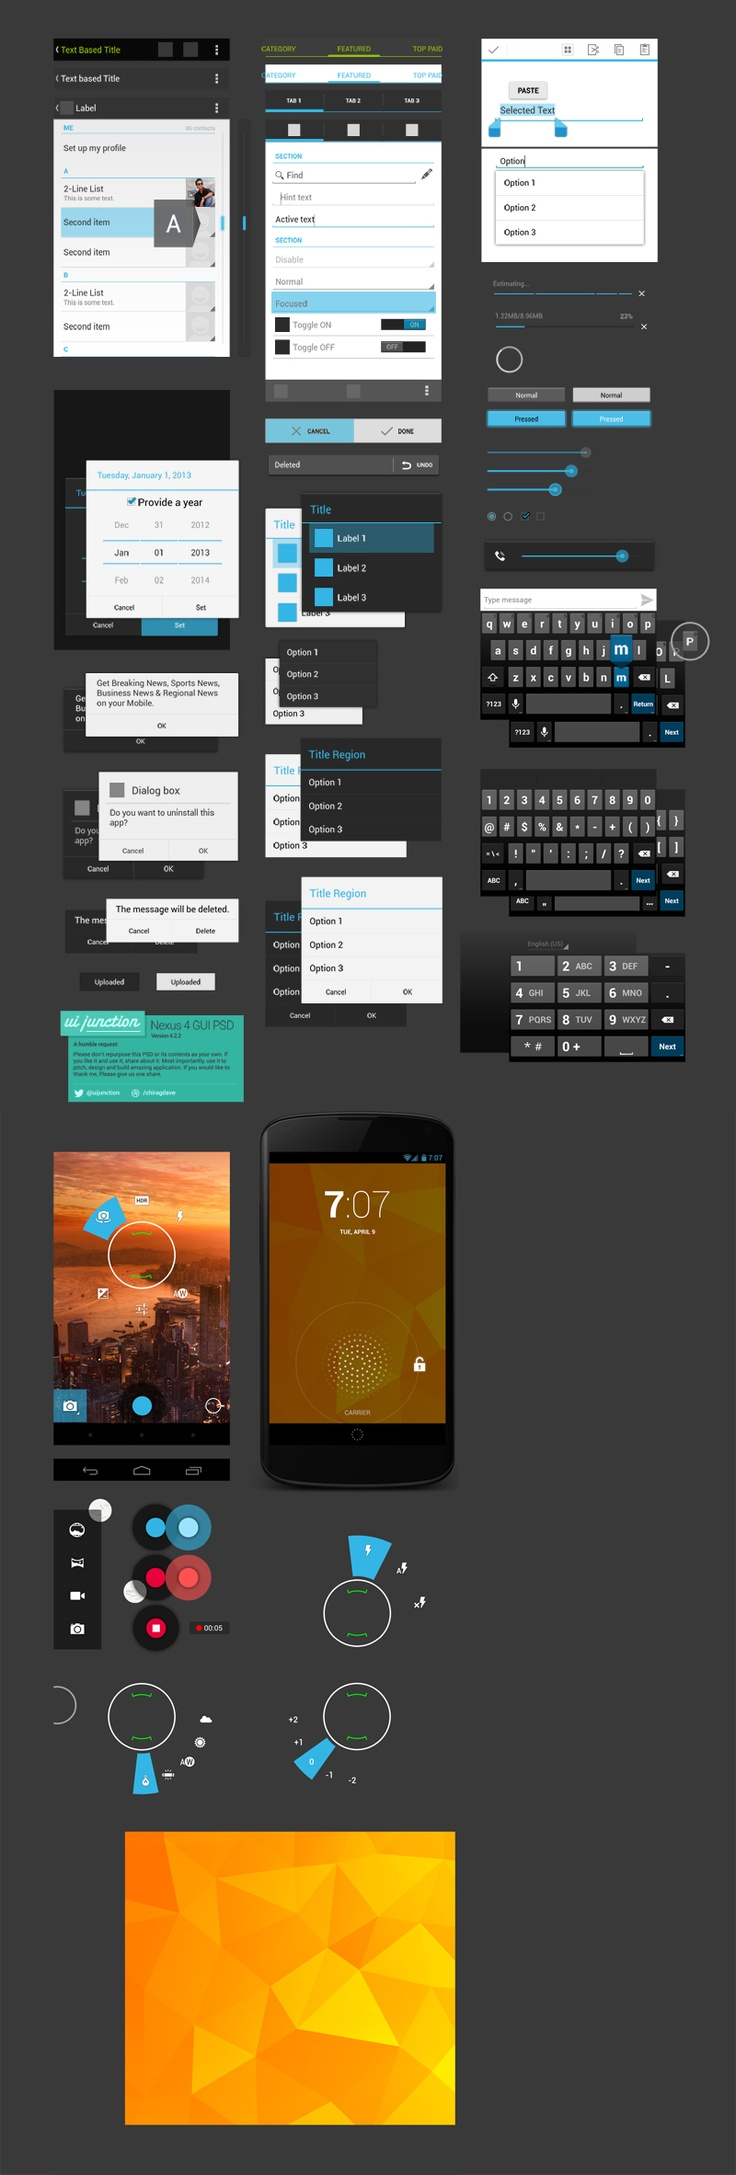 Free Nexus 4 GUI